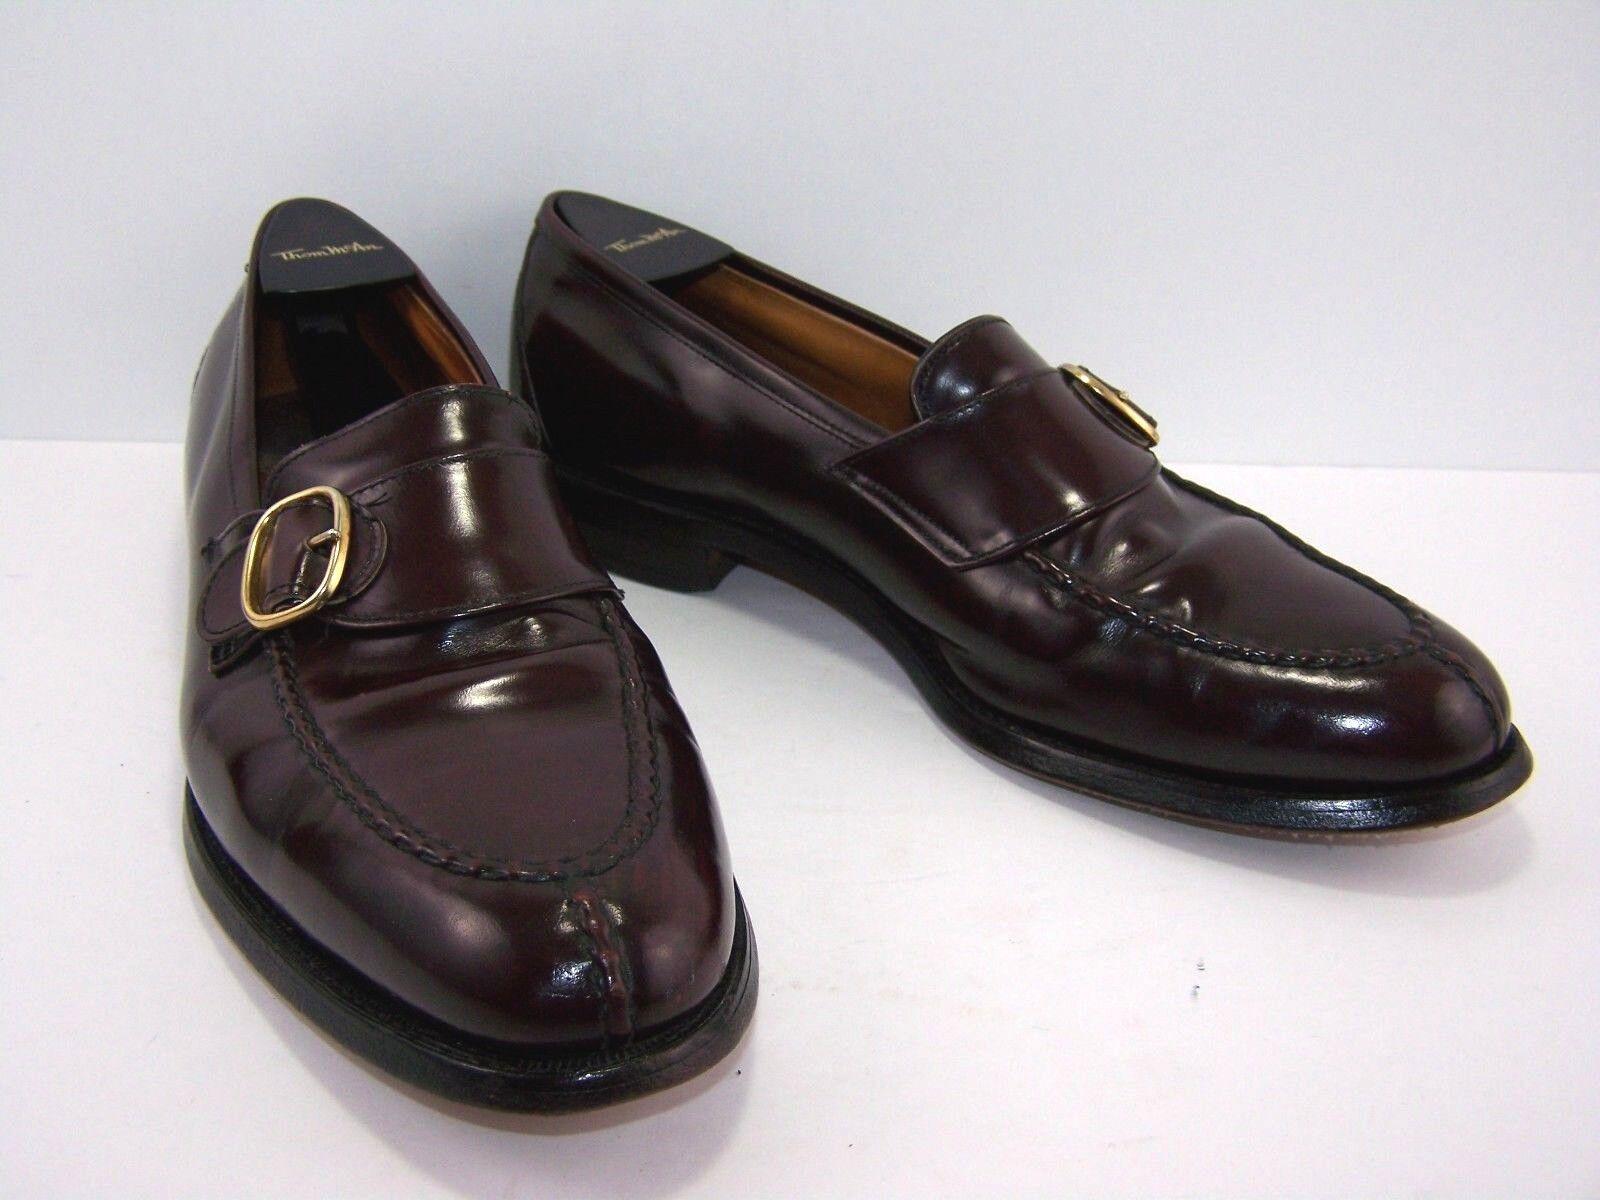 ALLEN EDMONDS Rawlins Mens Loafer Monk Strap shoes Size 10 Burgundy Apron Split